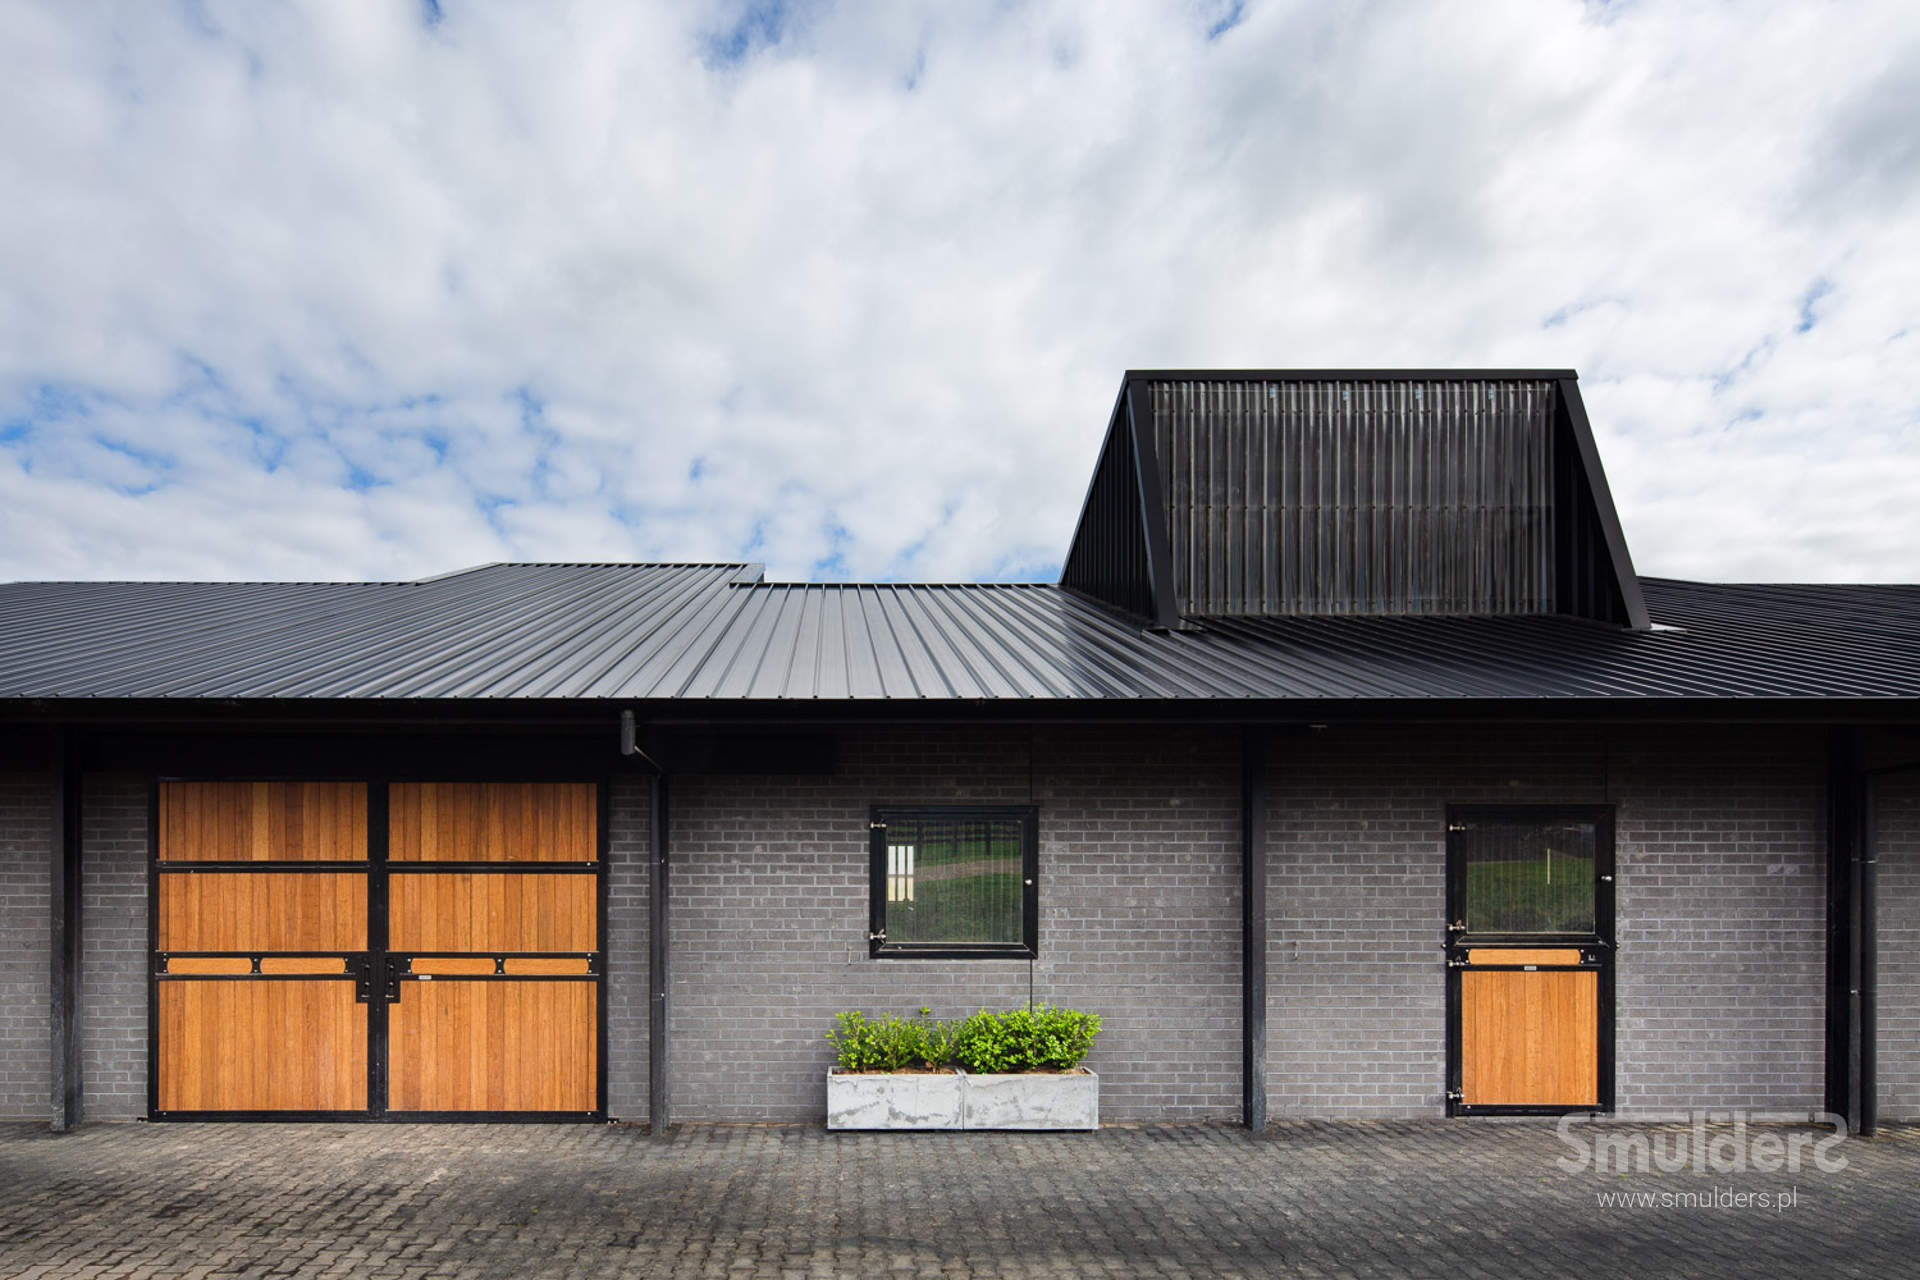 http://www.smulders.pl/wp-content/uploads/2019/10/f005_buckingham_barn-doors_doors_windows_KIL_SMULDERS_PL.jpg